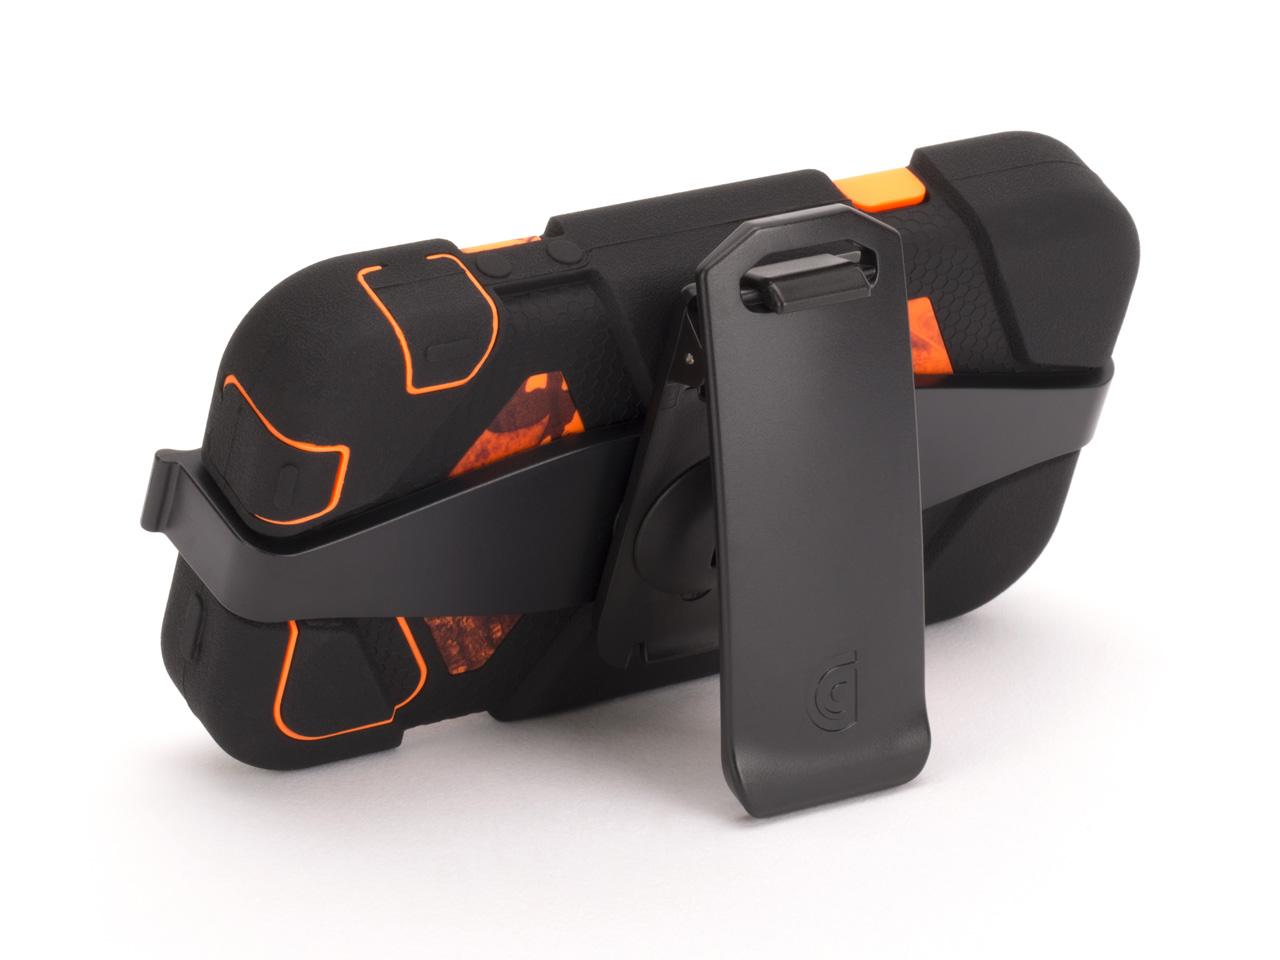 Blaze Survivor All-Terrain Case in Mossy Oak Camo with Belt Clip for iPhone 4/4s